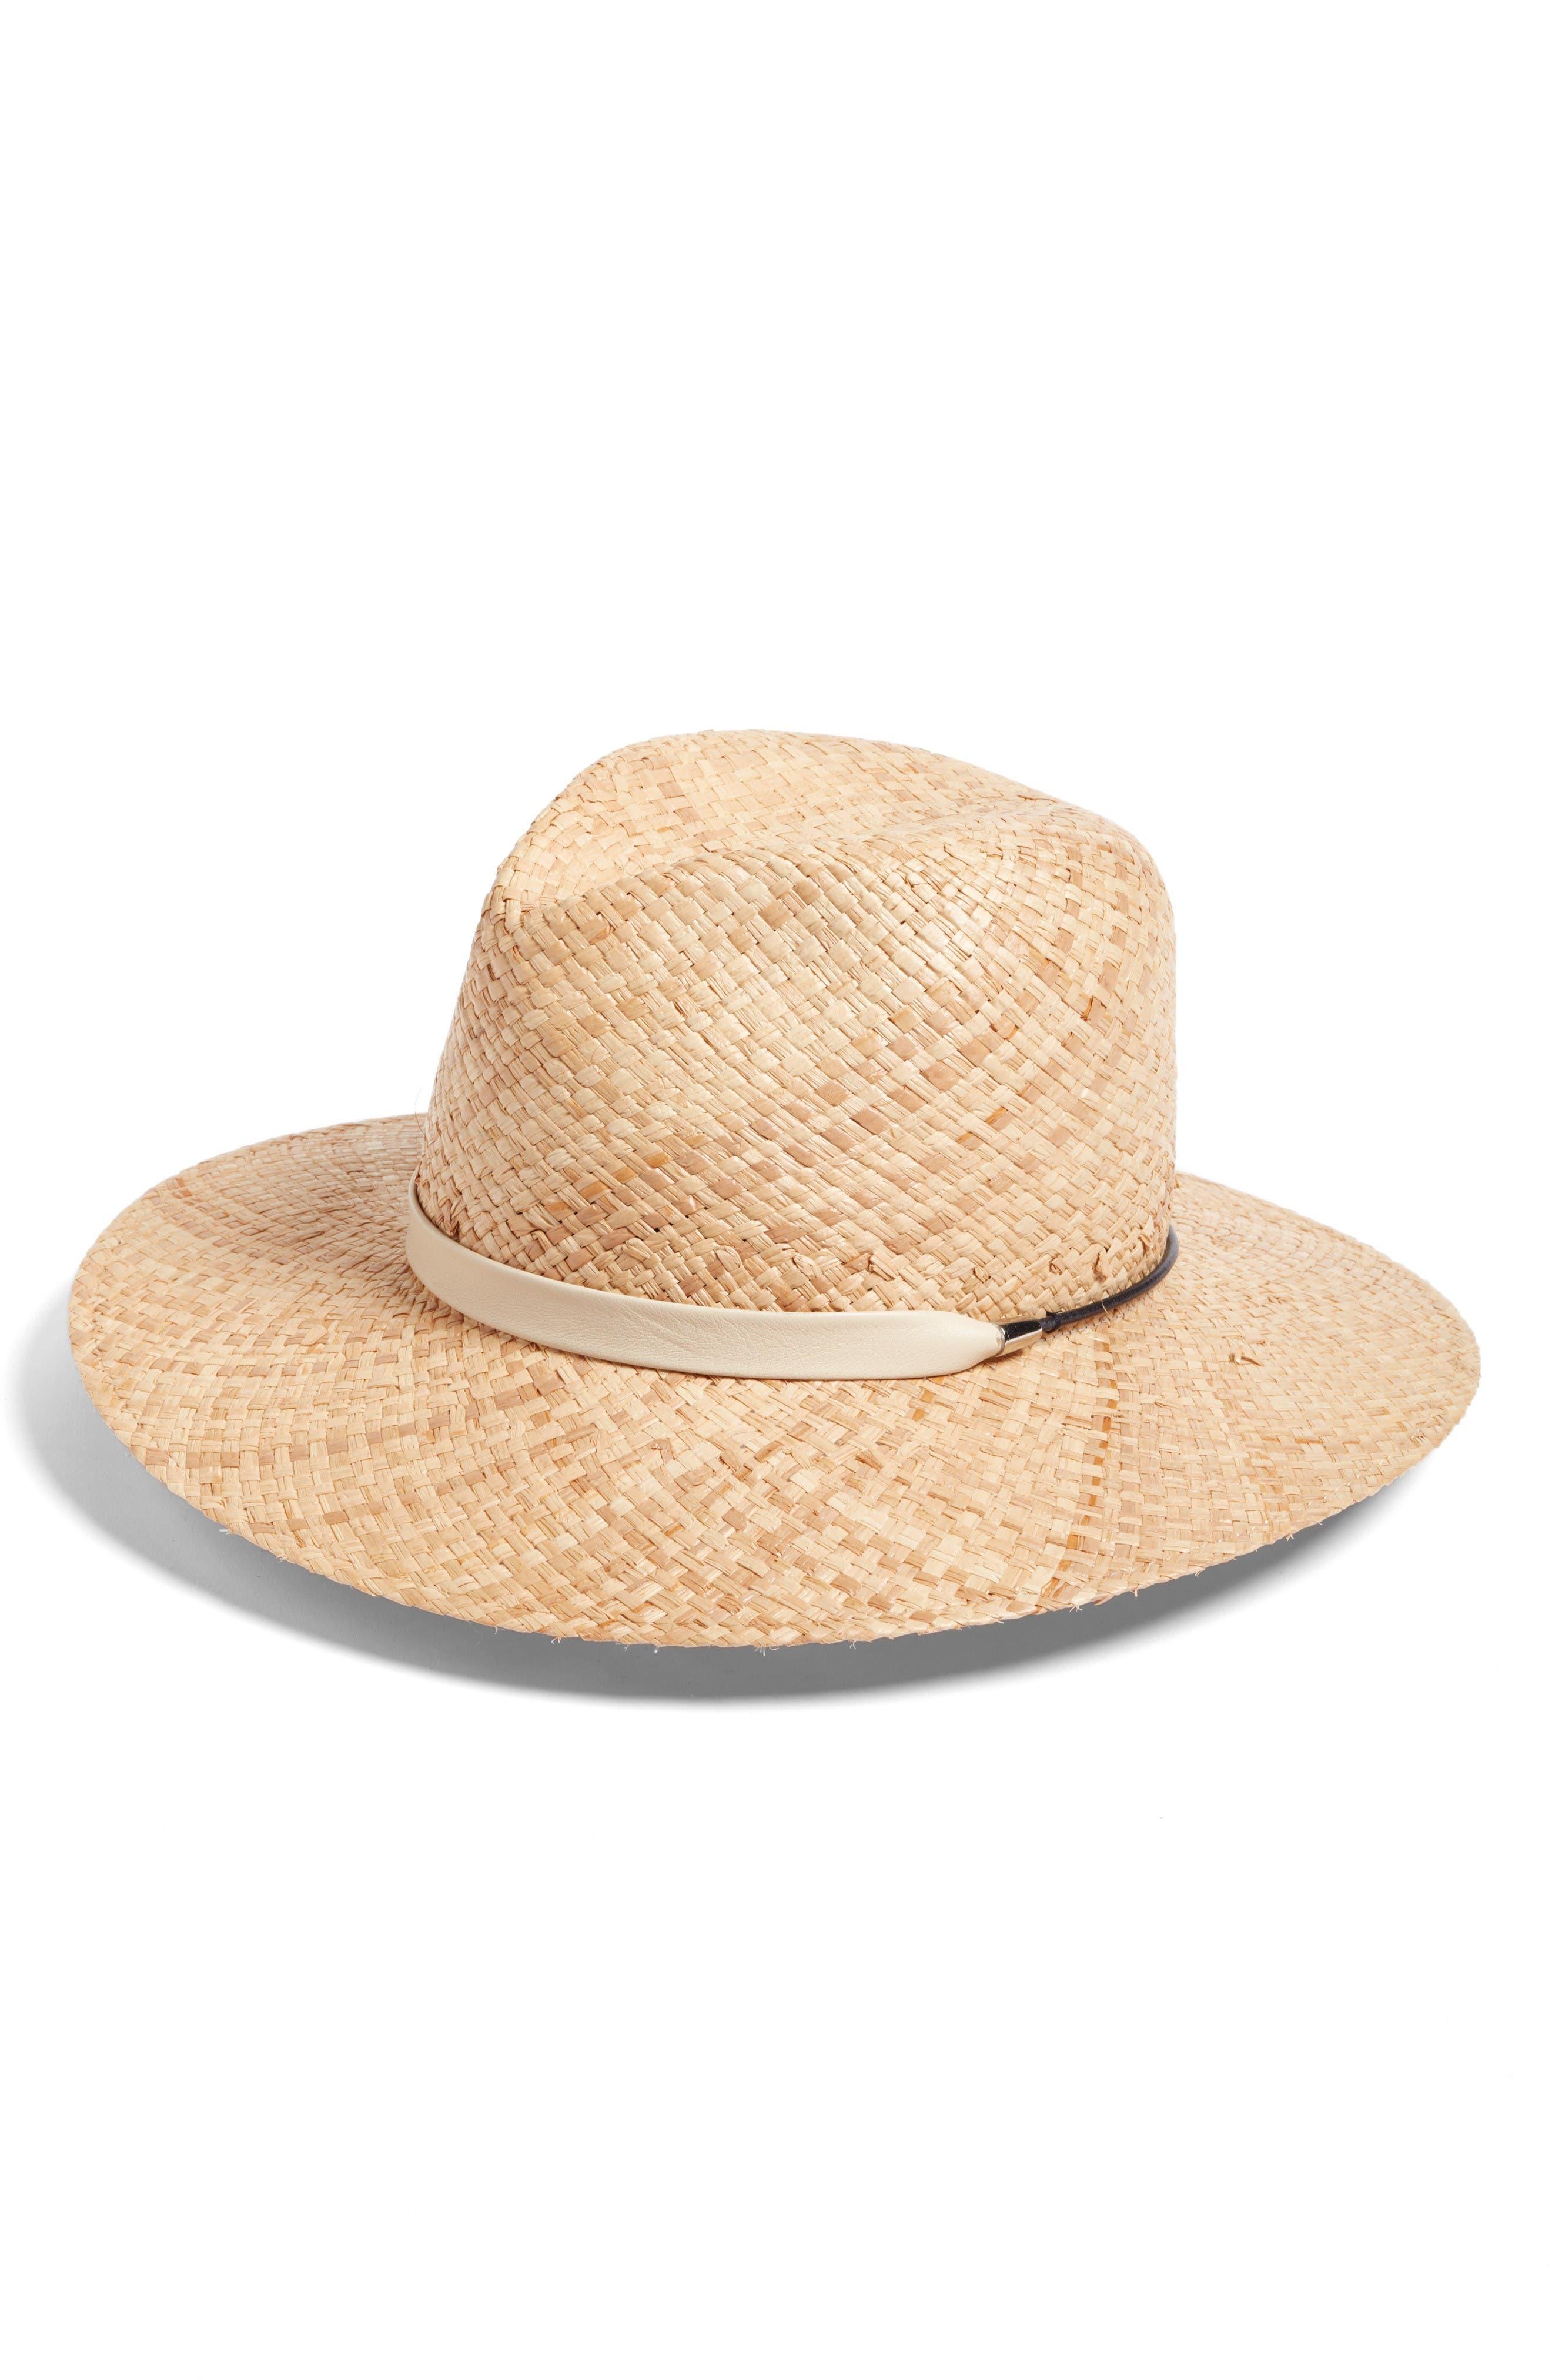 Alternate Image 1 Selected - rag & bone Wide Brim Raffia Hat